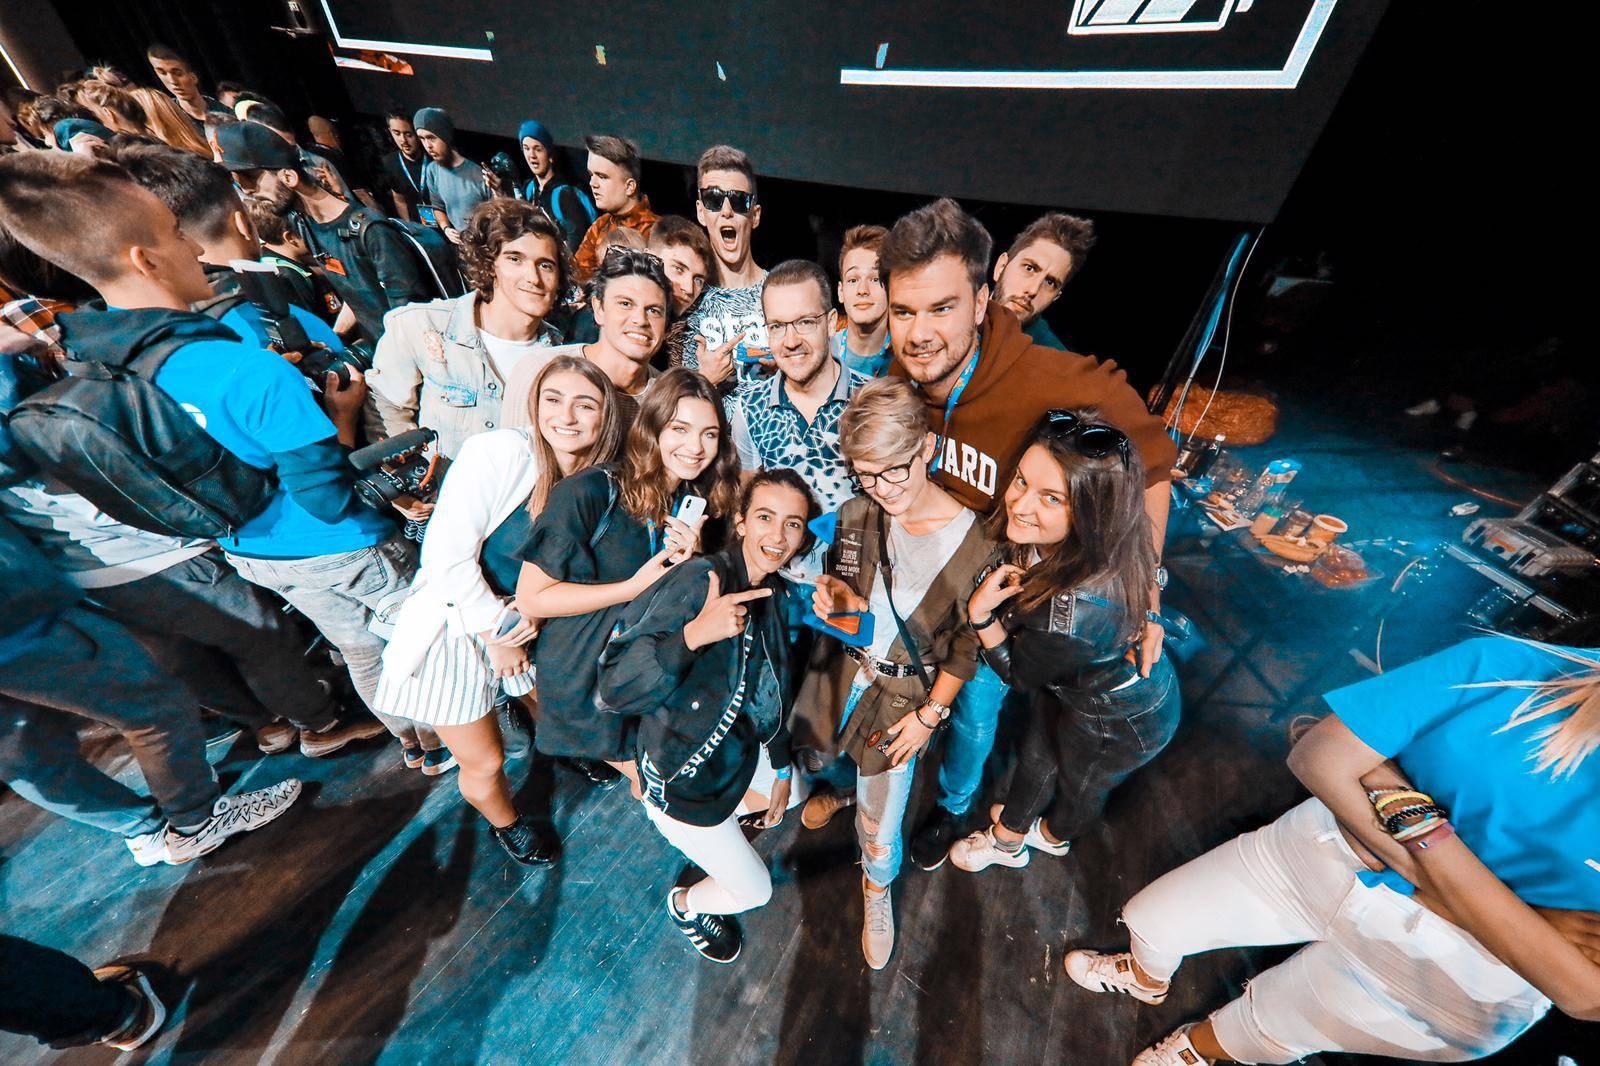 Fanovi plakali da vide hrvatske youtubere: 'Matija, volim te!'